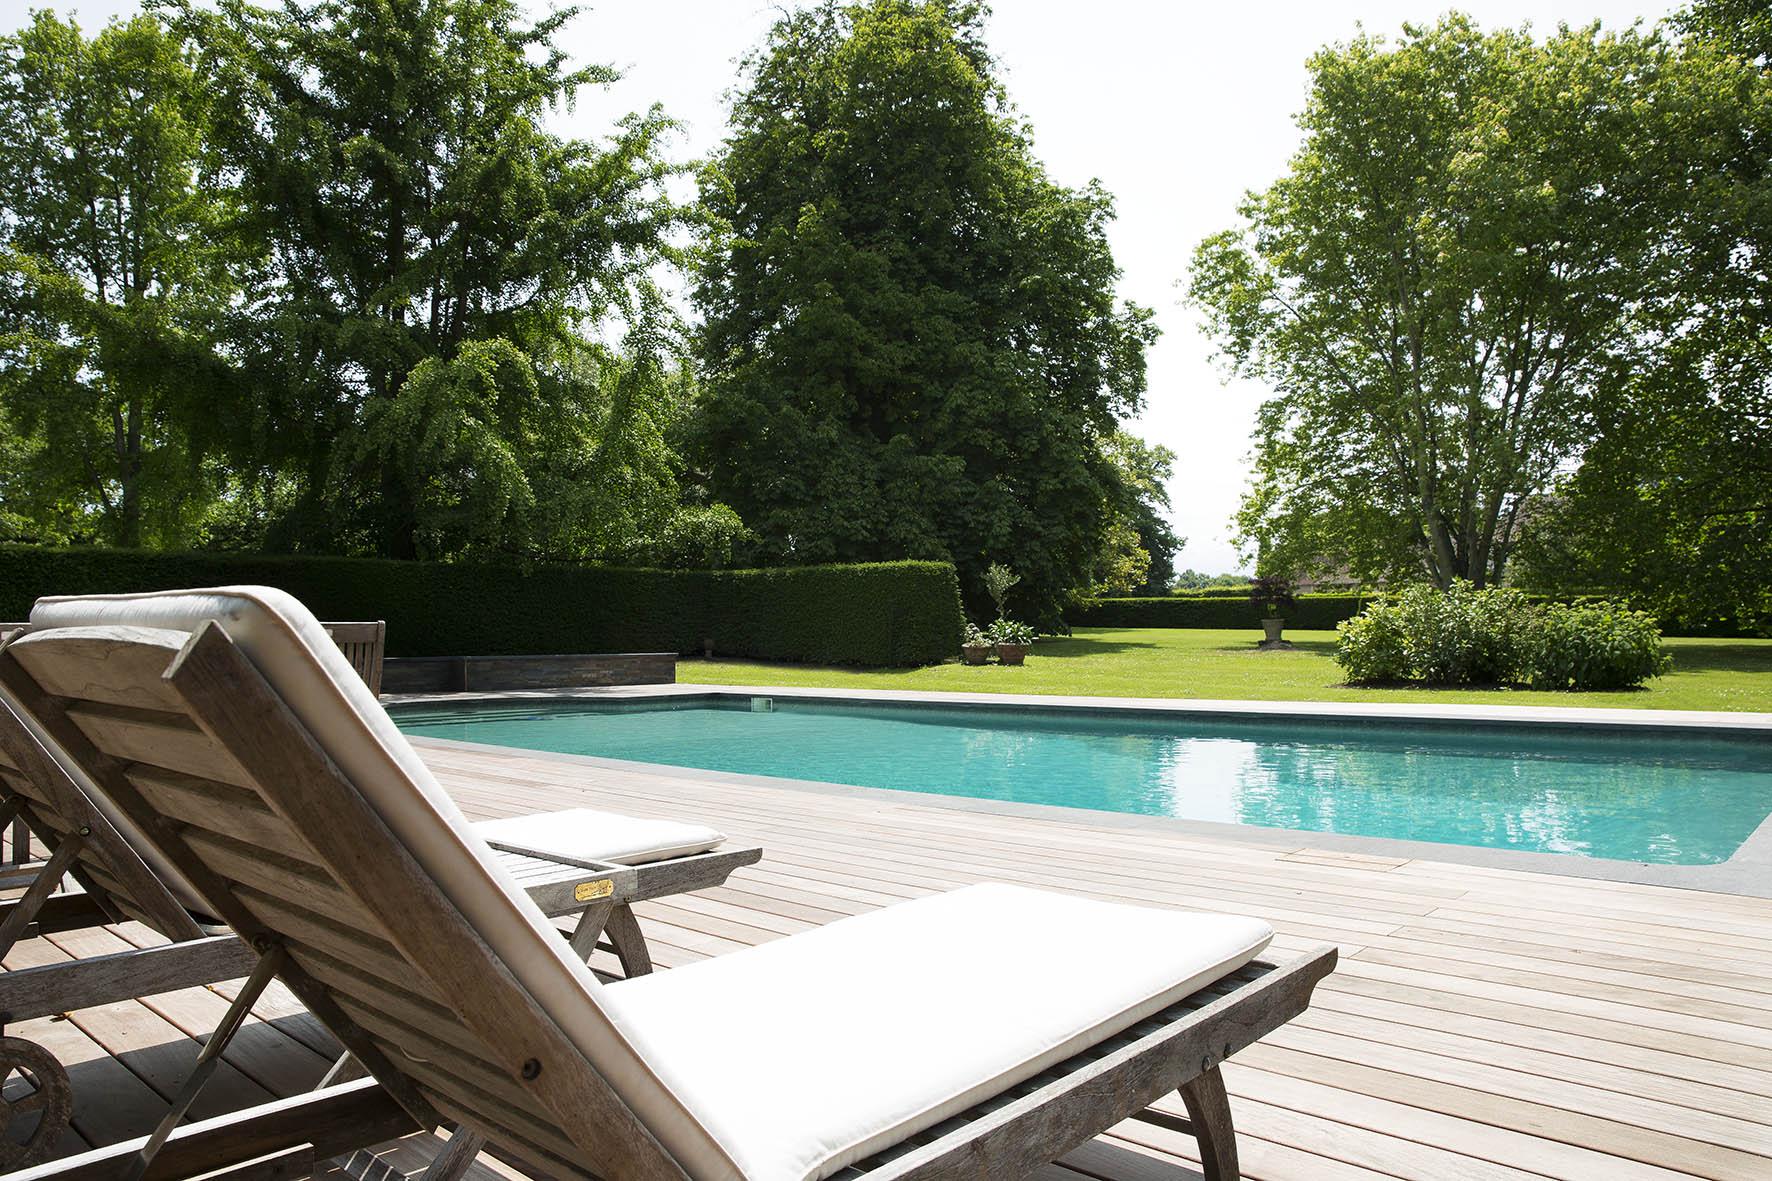 Index of wp content flagallery piscine for Piscine chateau d eau reims